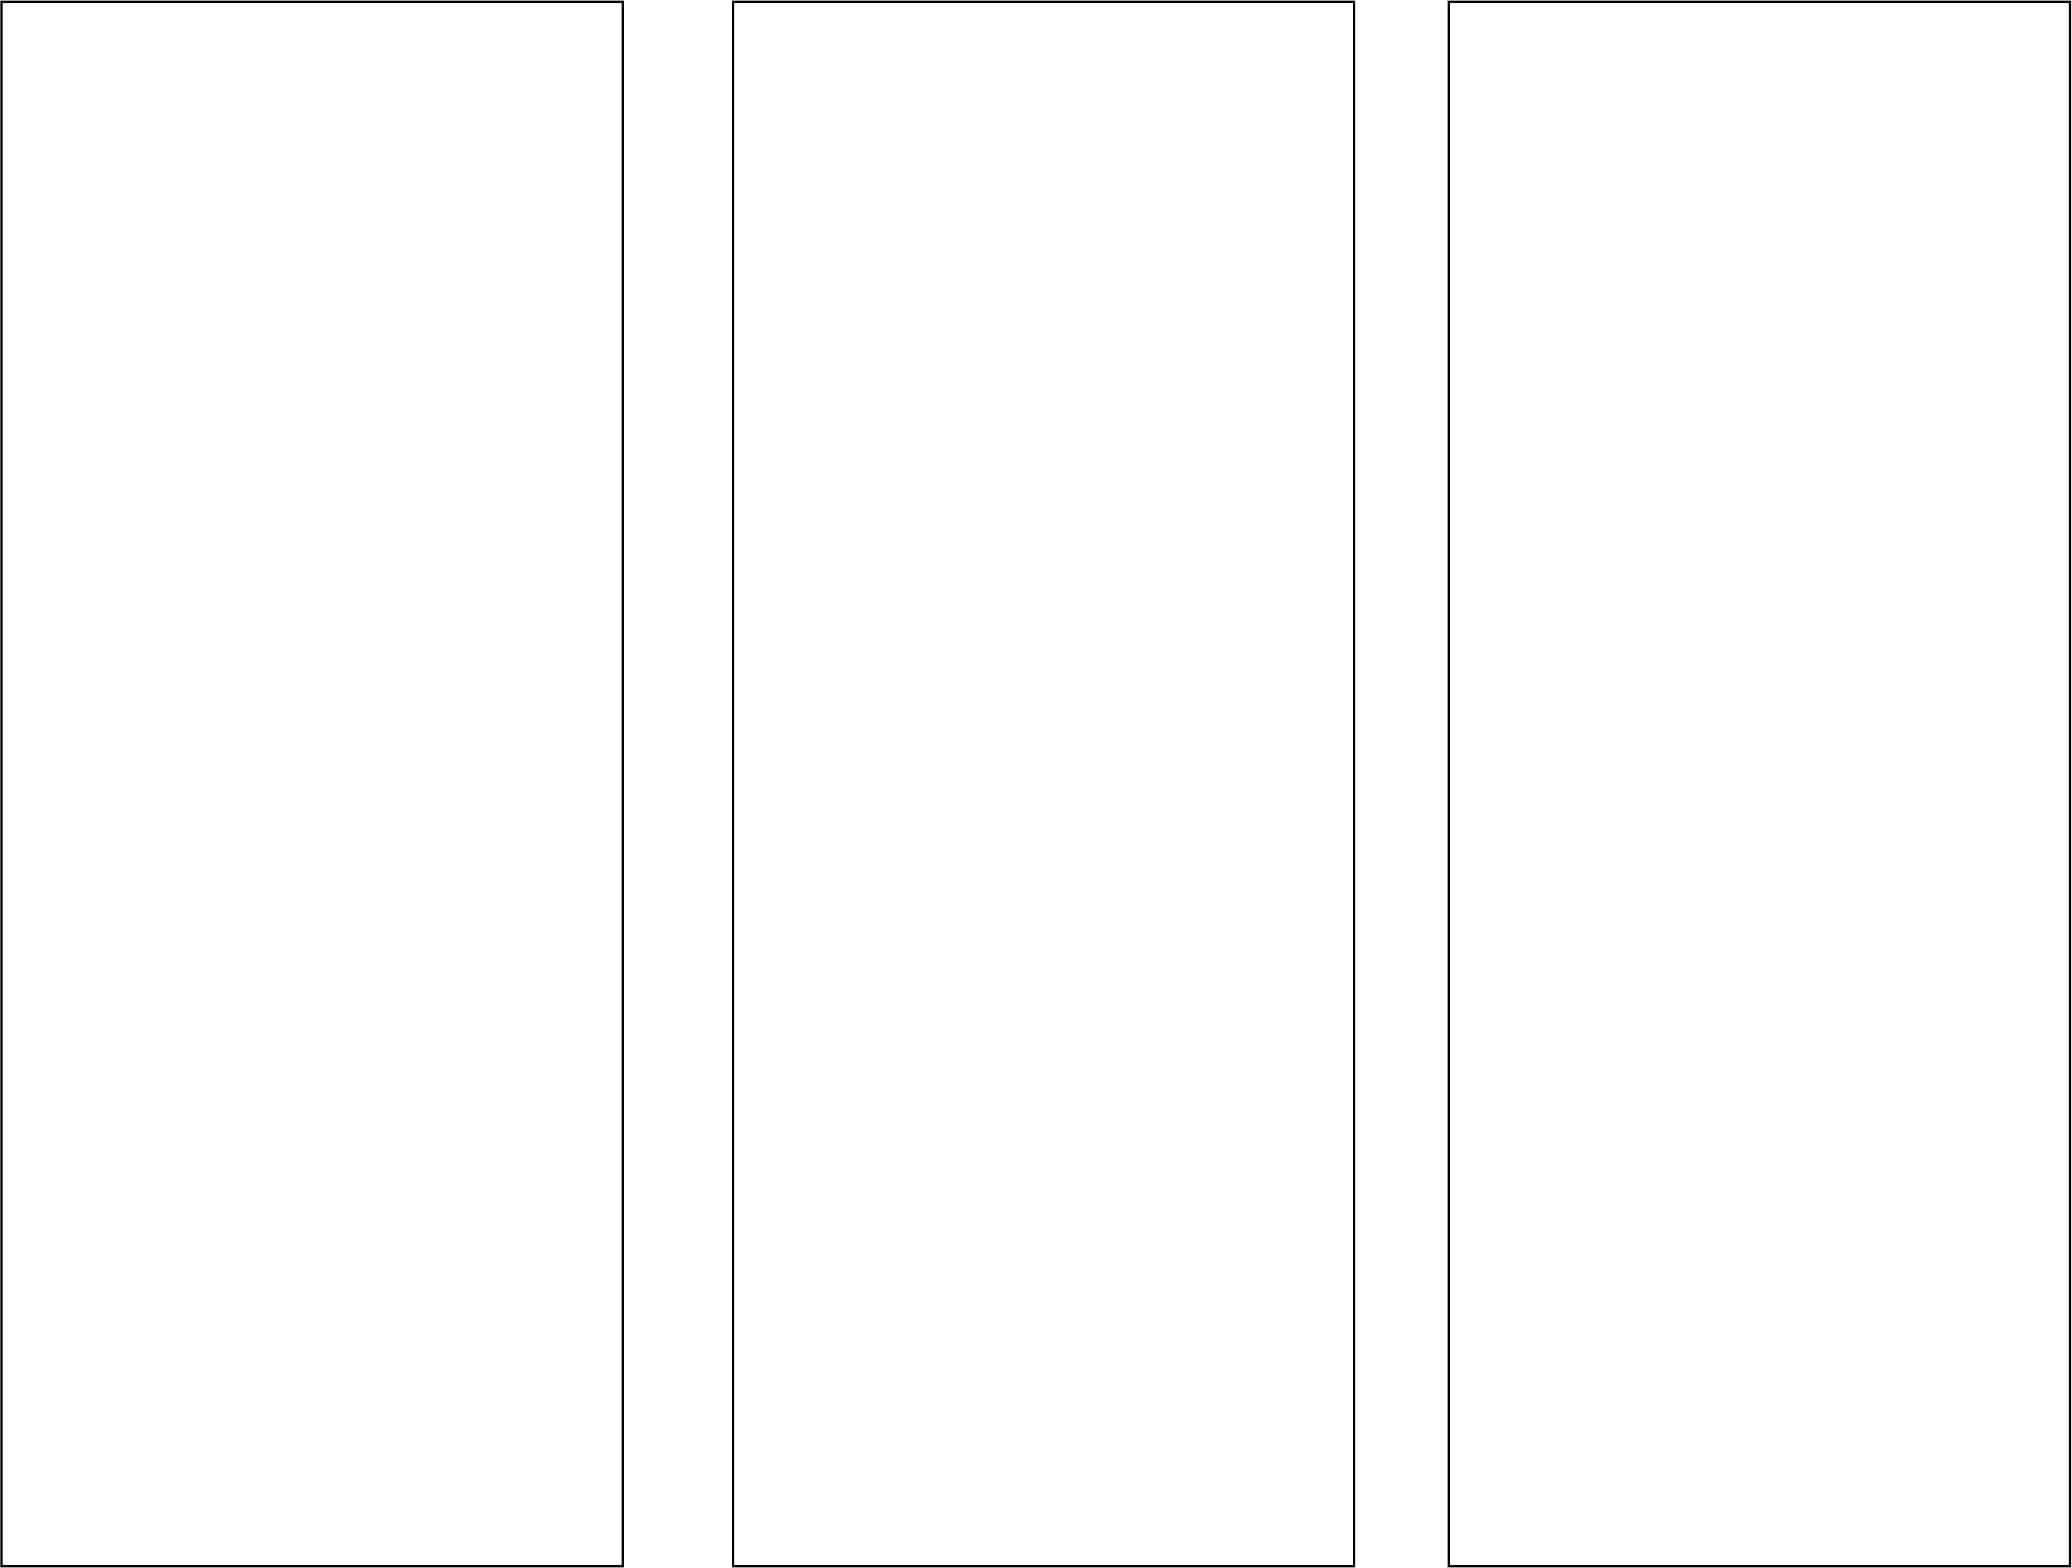 Blank Brochure Template - Calep.midnightpig.co In Travel Brochure Template Ks2